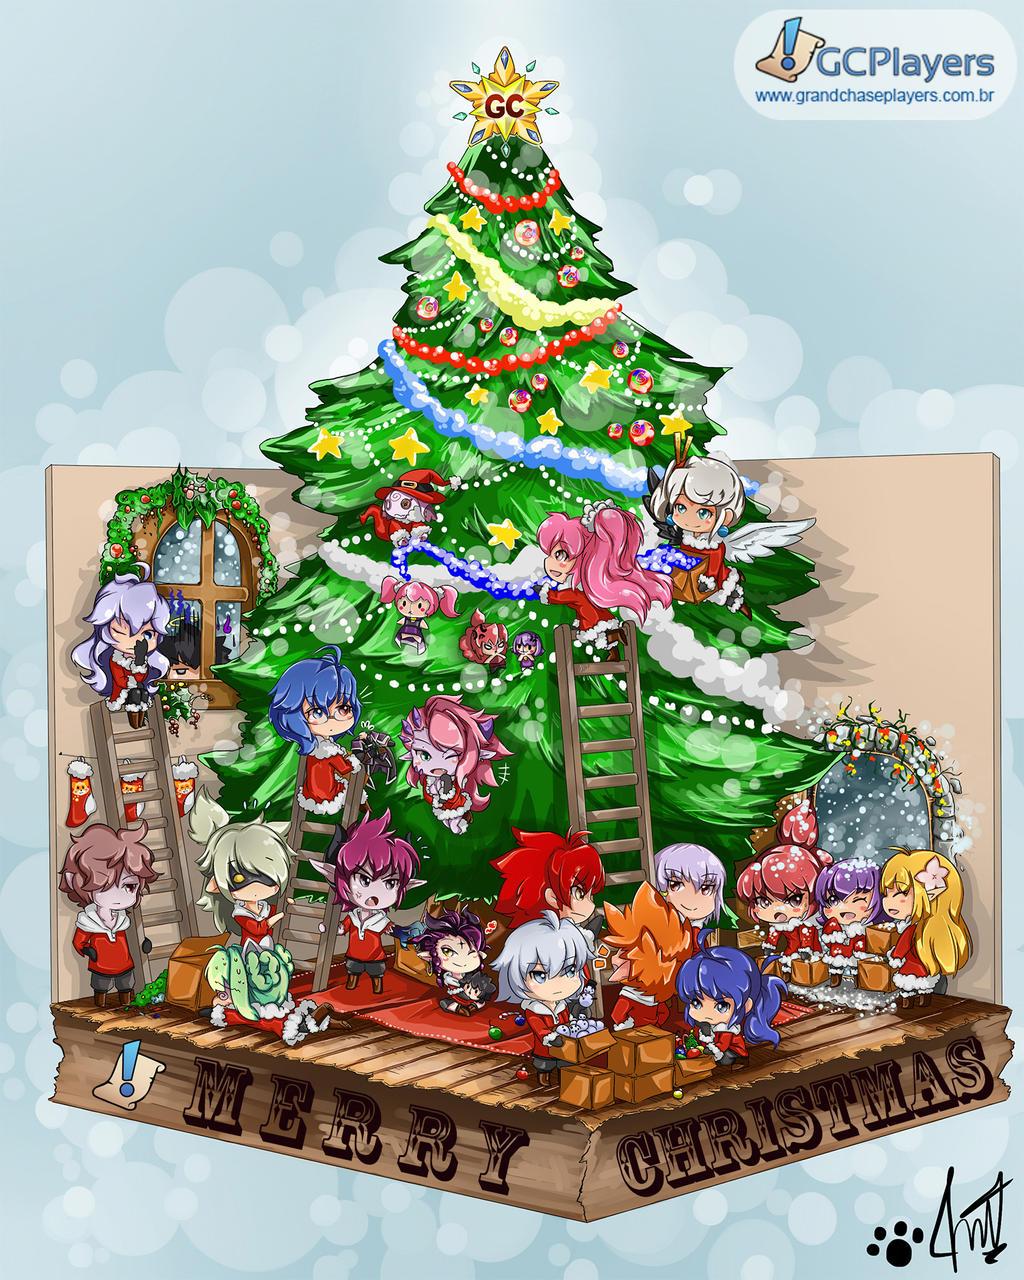 Grand Chase Merry Christmas by miyuu490 on DeviantArt